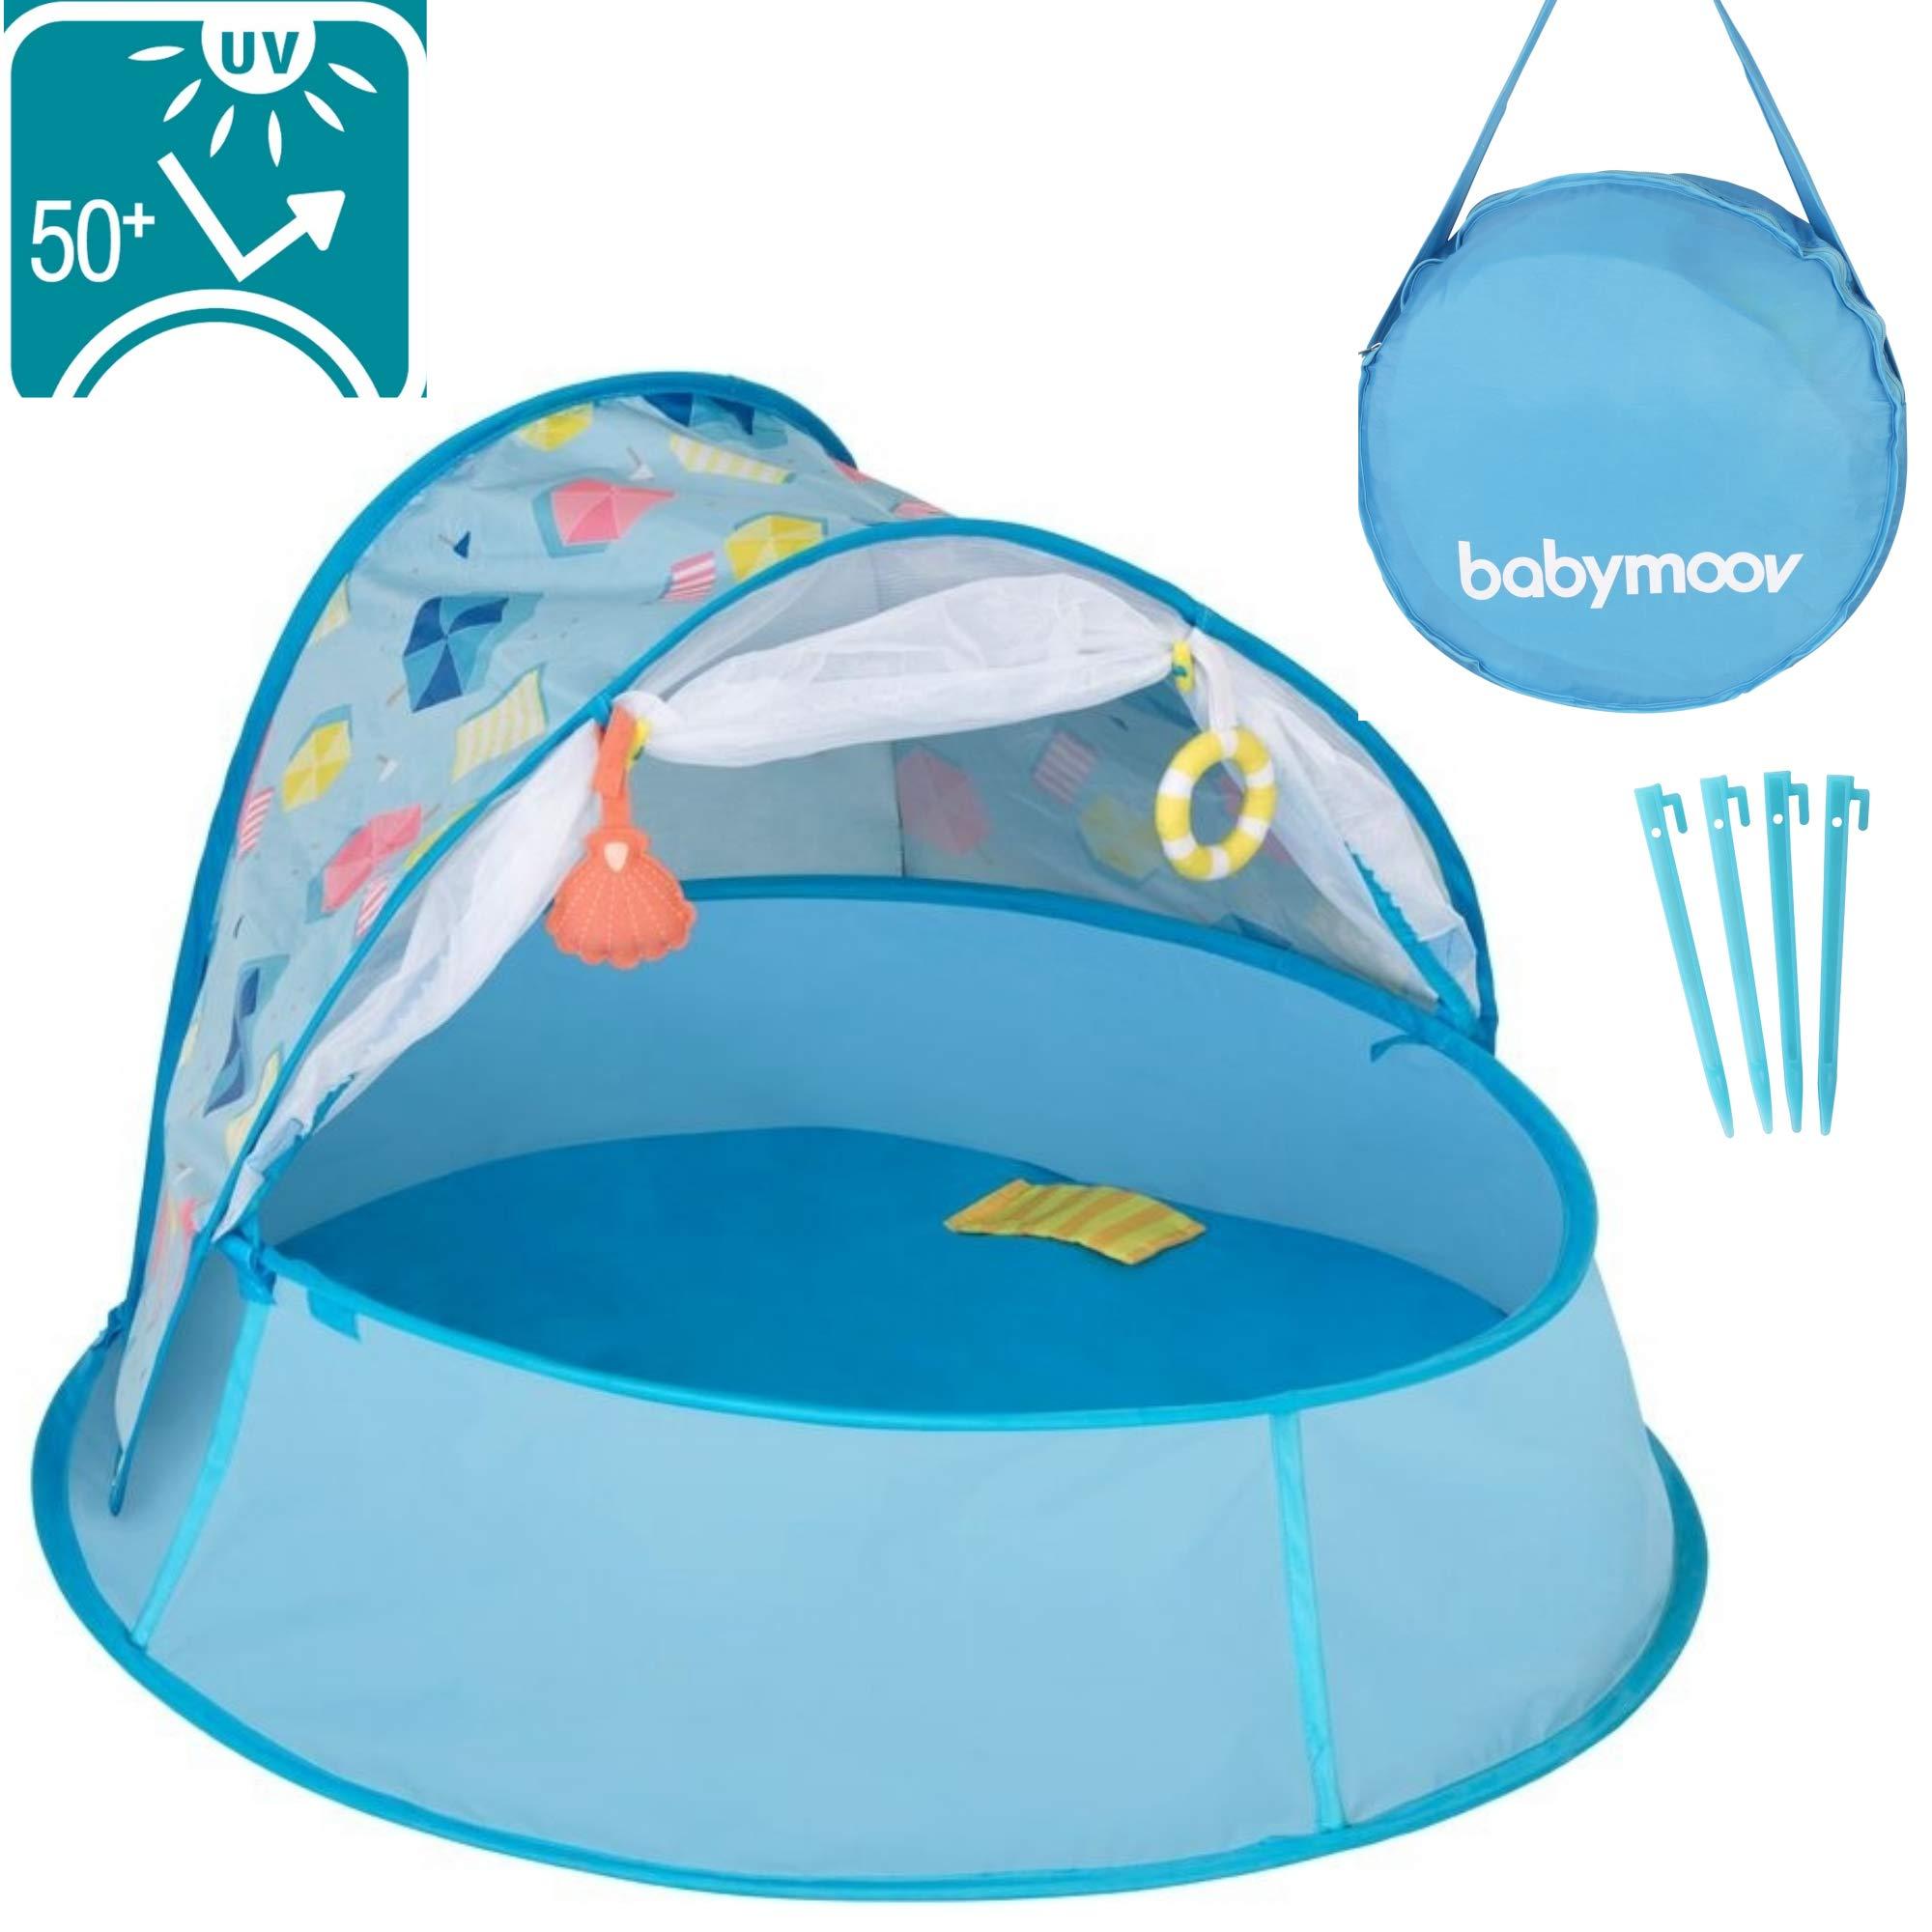 Babymoov Aquani Tent & Pool | 3 in 1 Pop Up Tent, Kiddie Pool and Play Yard by Babymoov